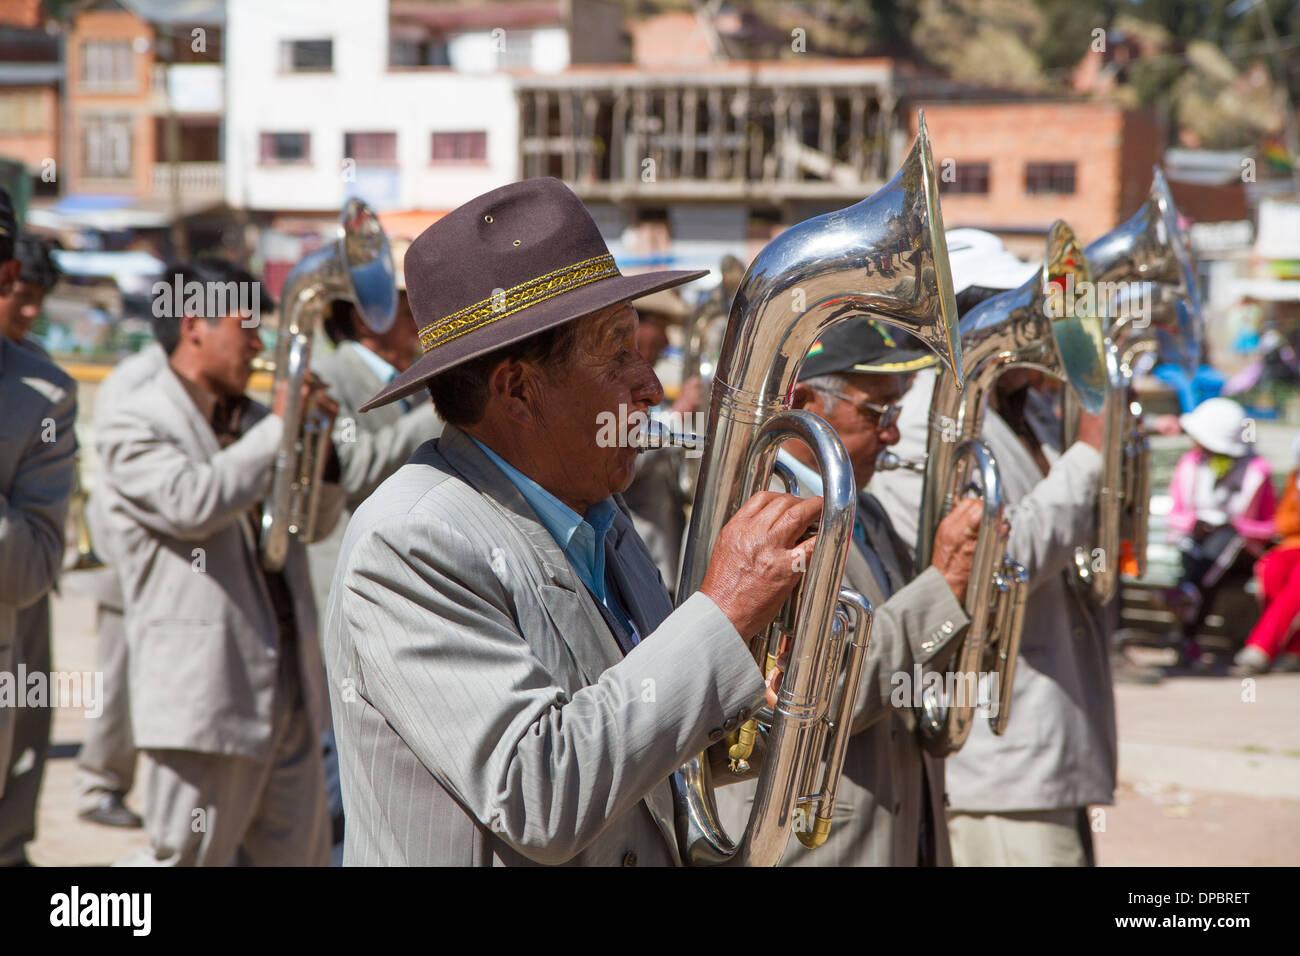 Musicians at a parade in San Pedro, Bolivia - Stock Image